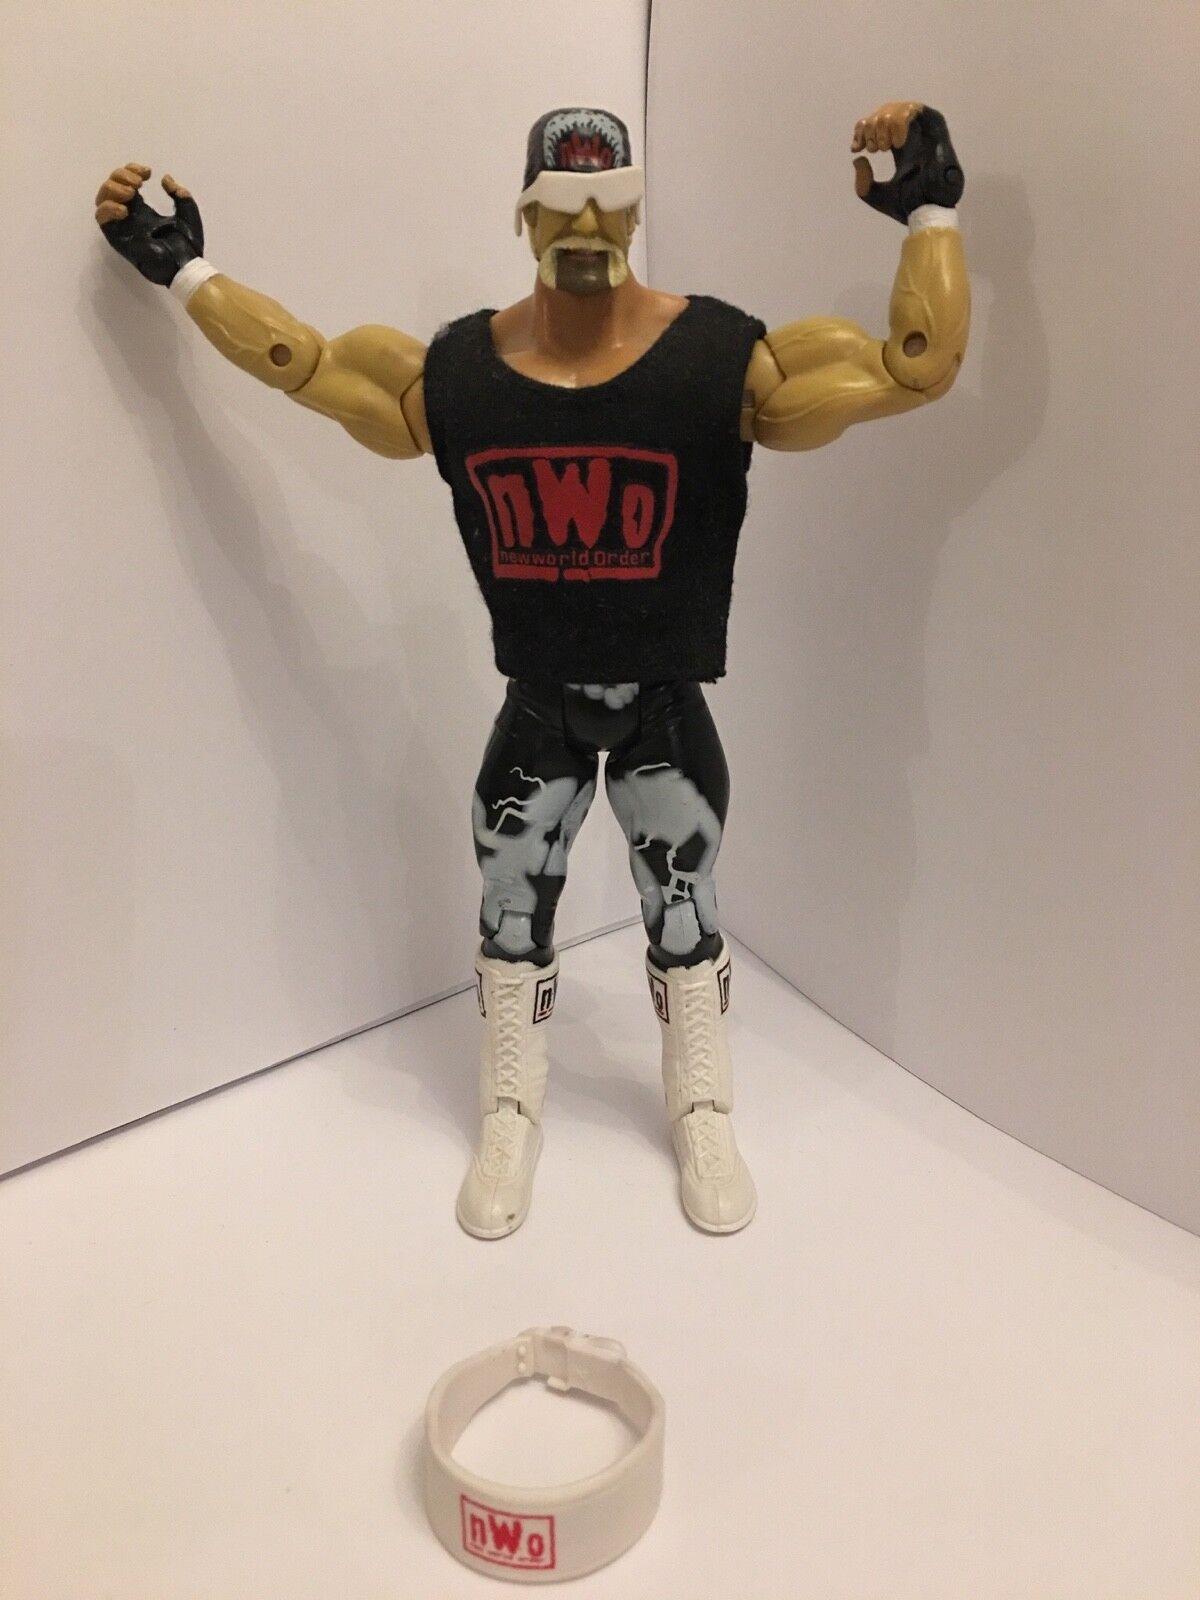 Rare wwe Wwf tna nwo hulk hogan  jakks classic toy wrestling figure